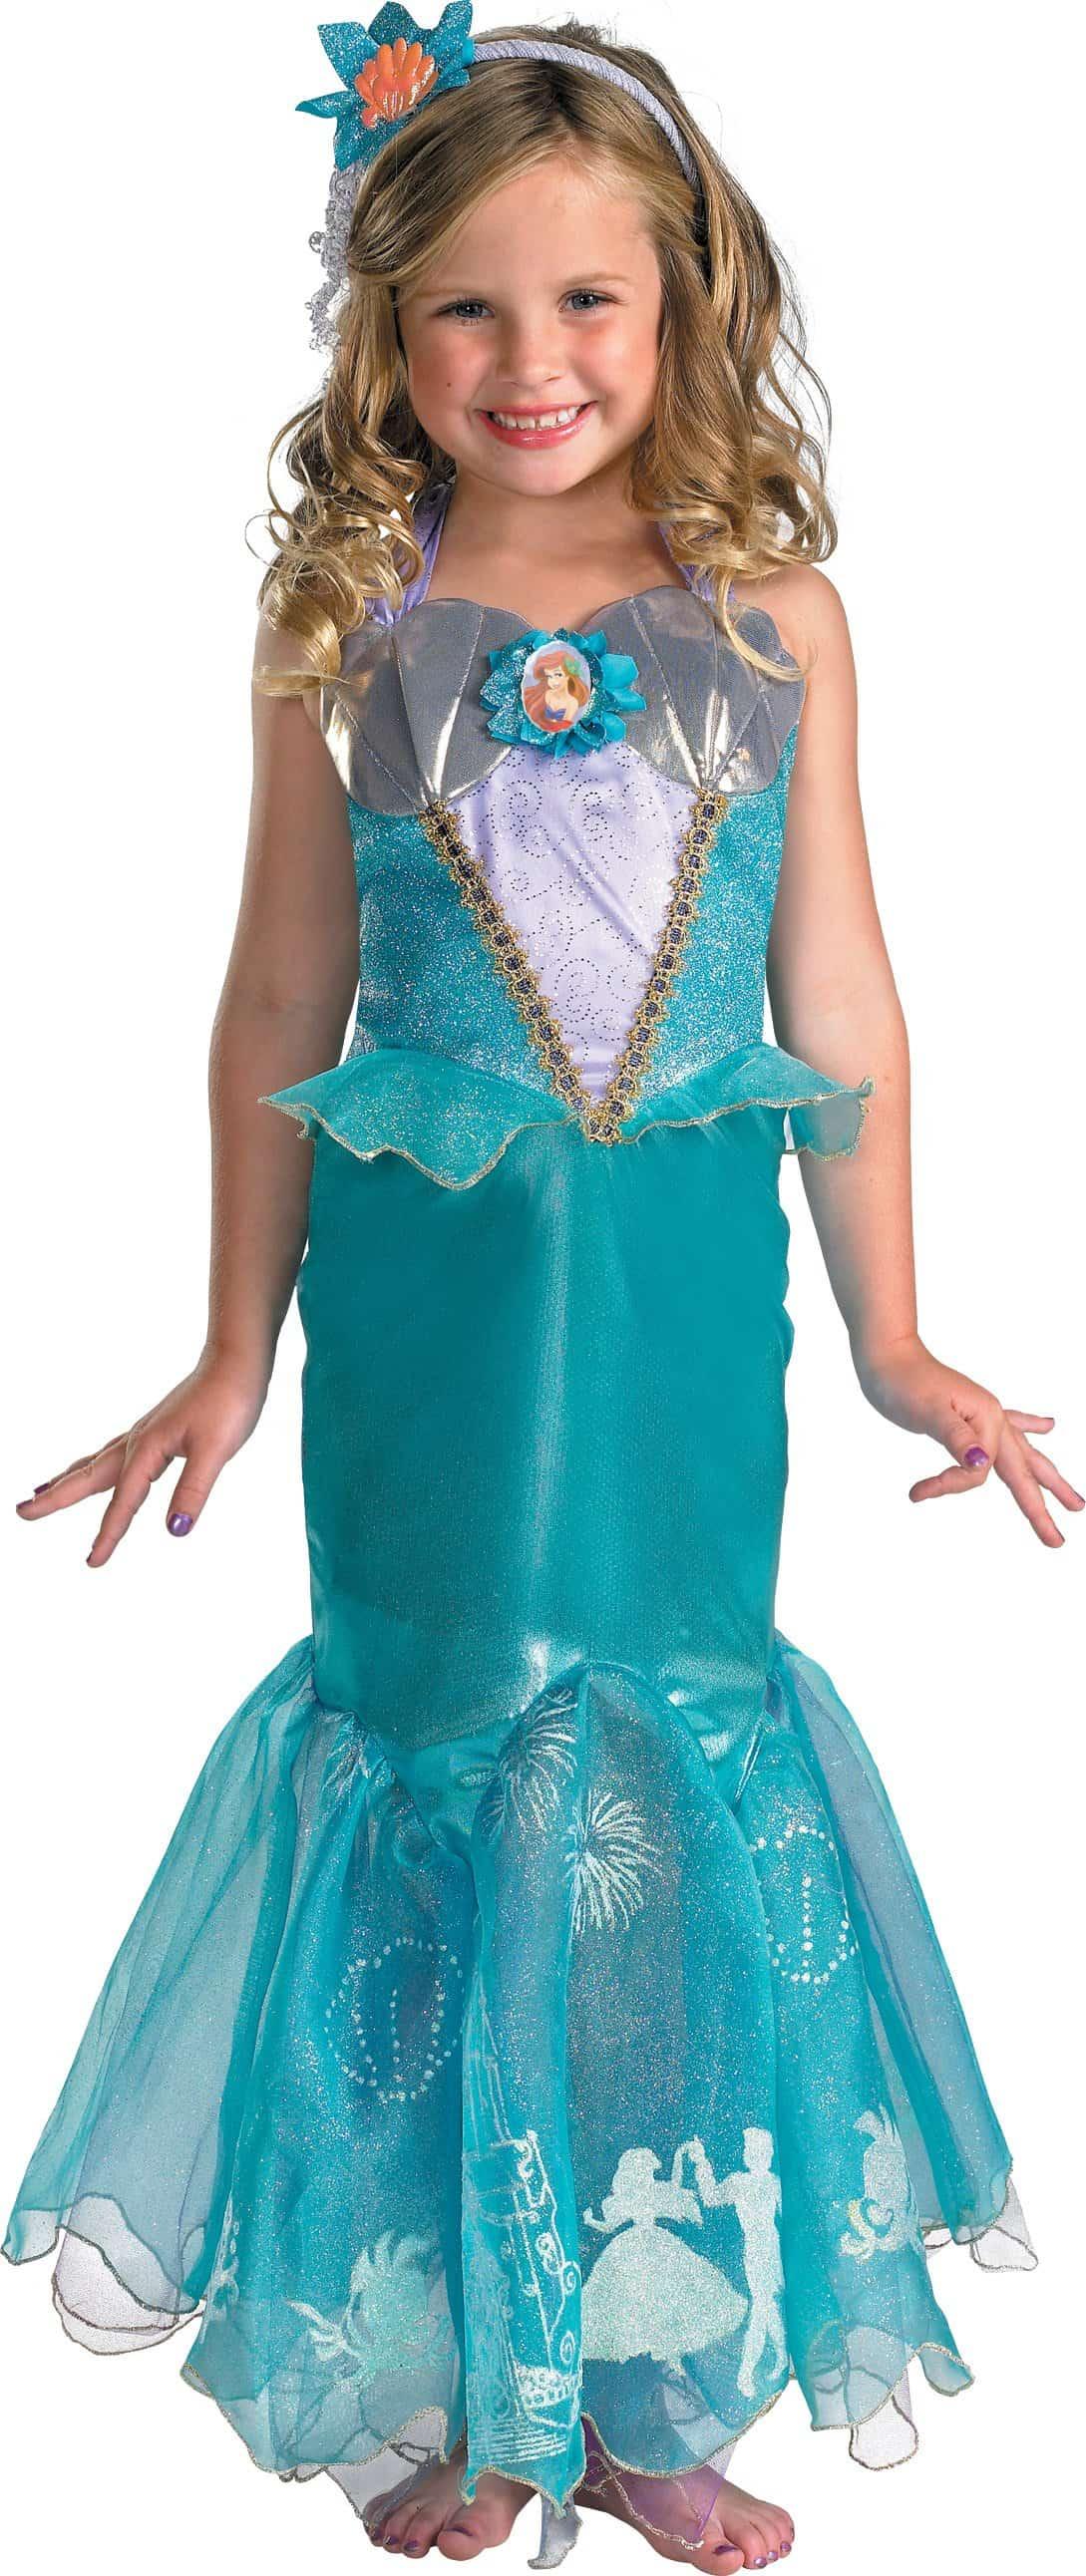 Disney Storybook Ariel Prestige Toddler / Child Costume